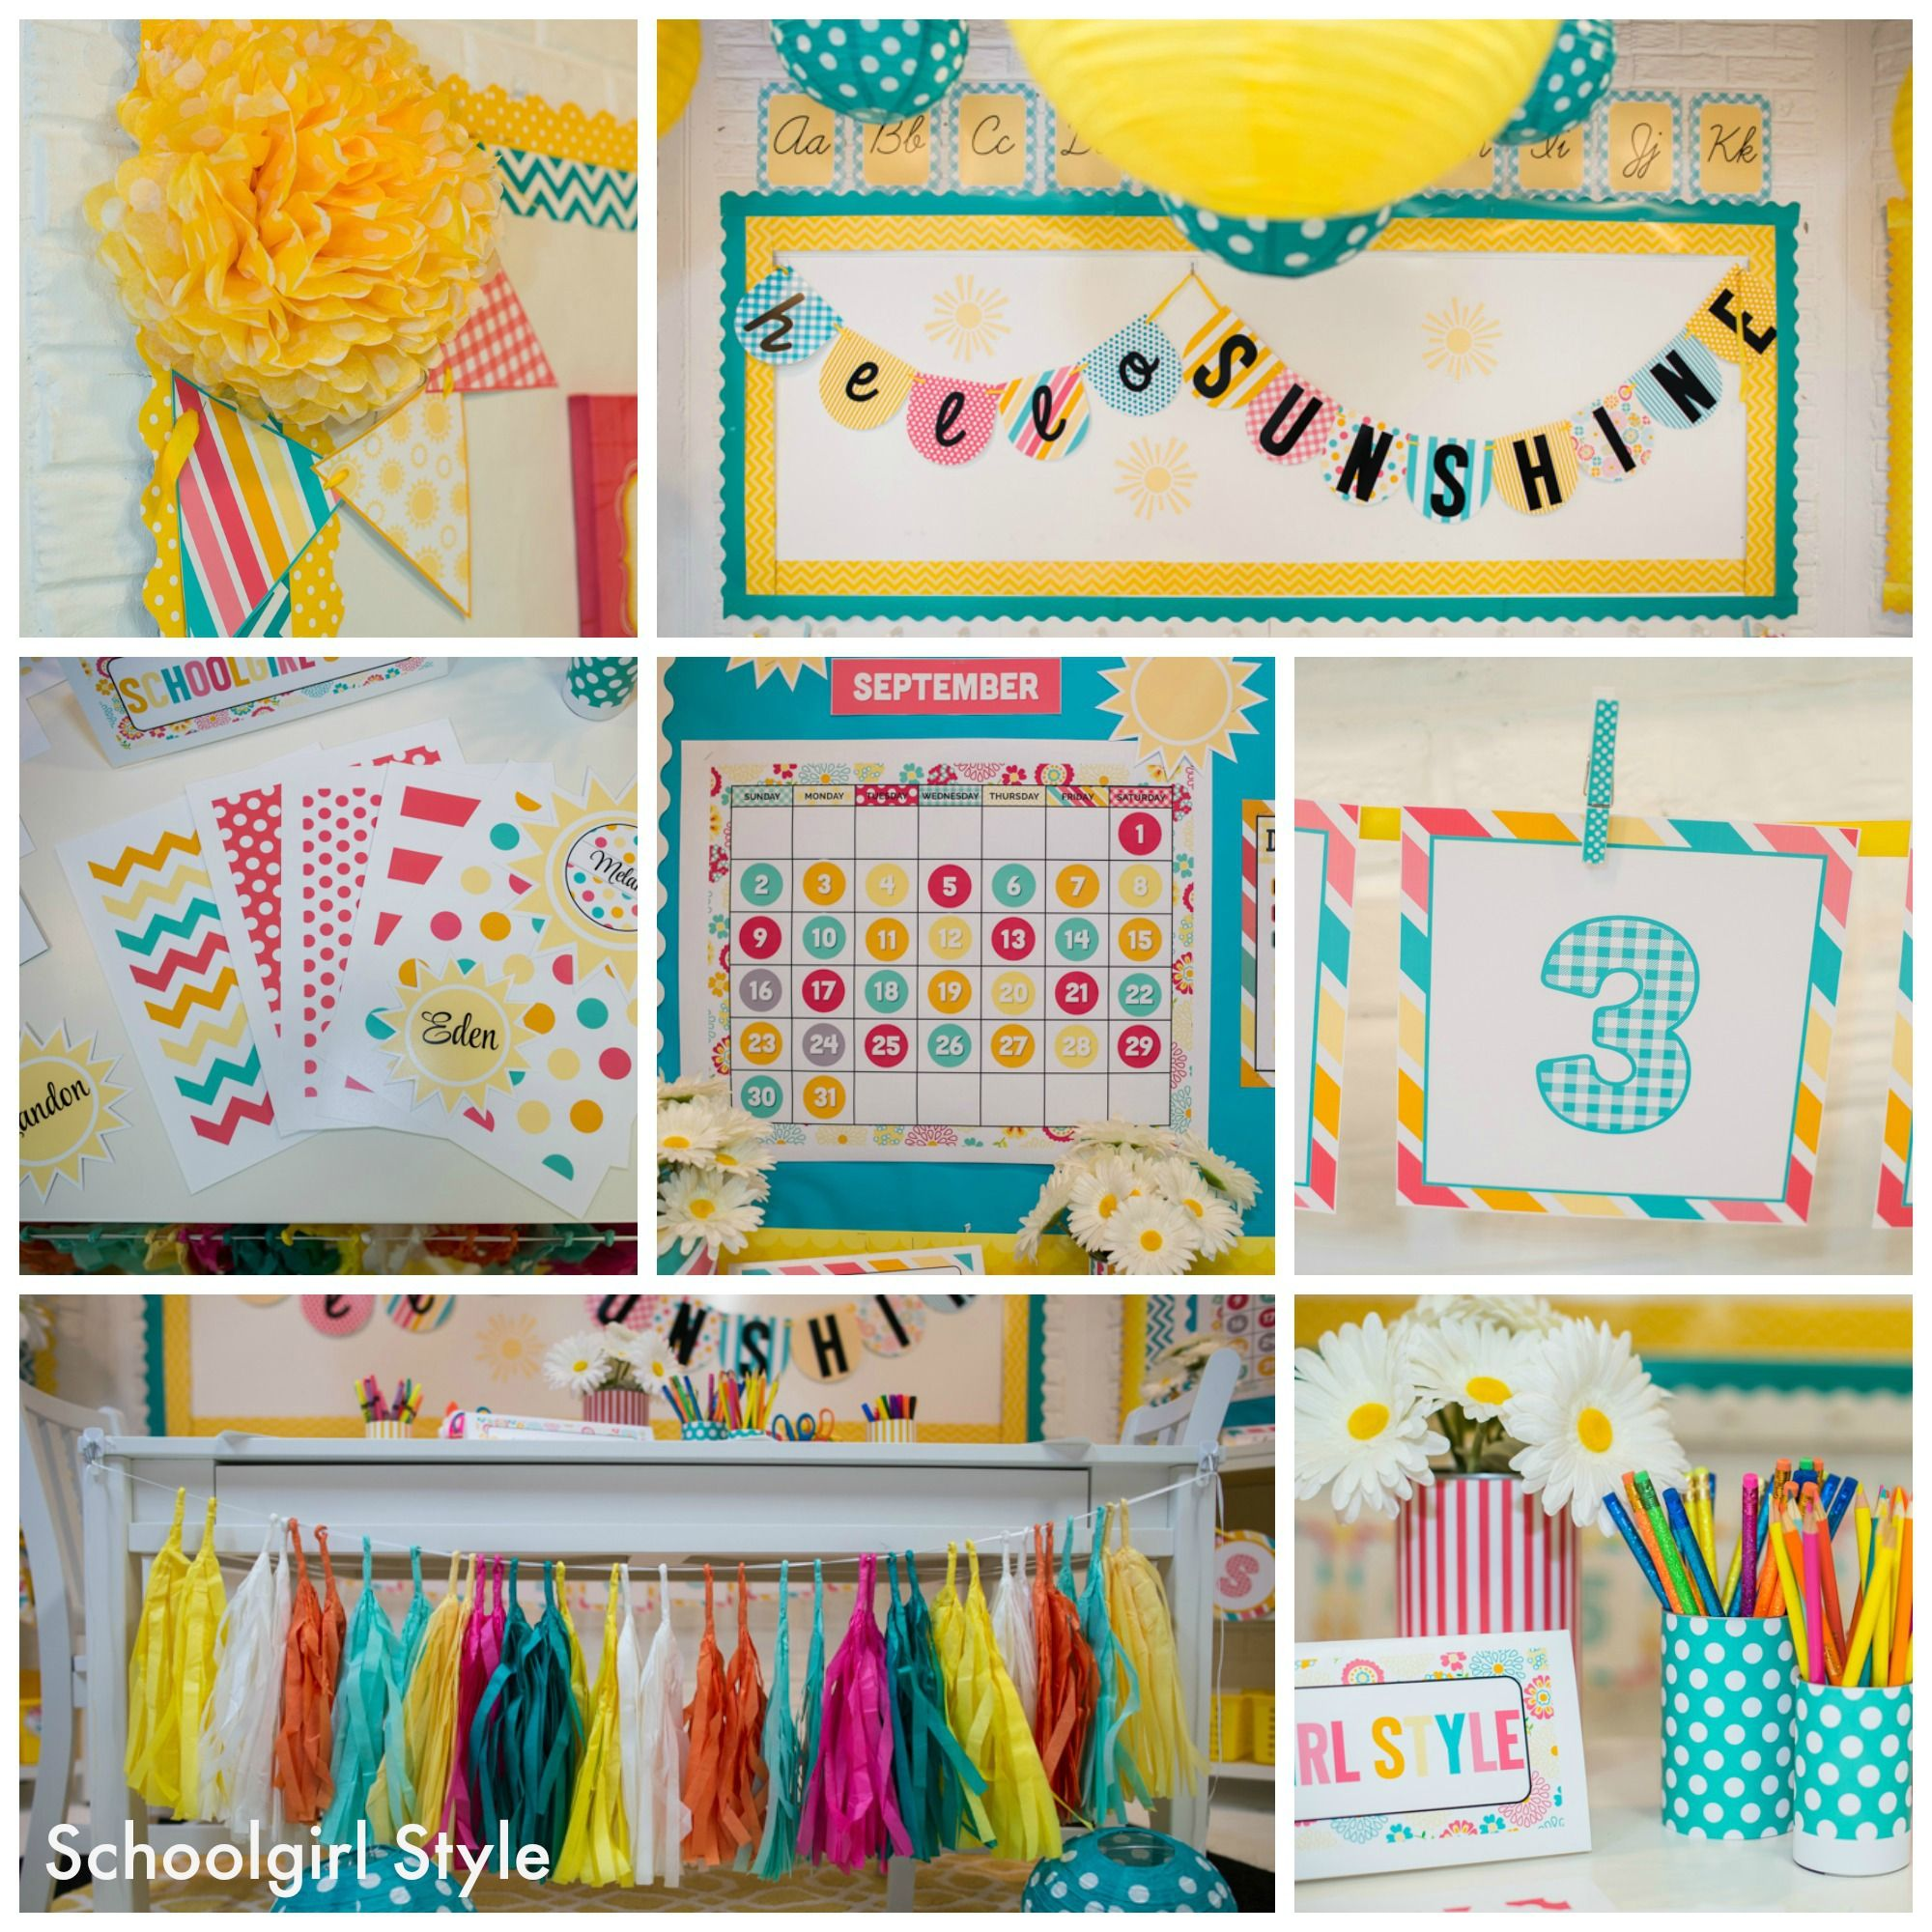 Kindergarten Classroom Theme Decorations Sunshine Classroom Theme By Schoolgirl Style Classroom Decor